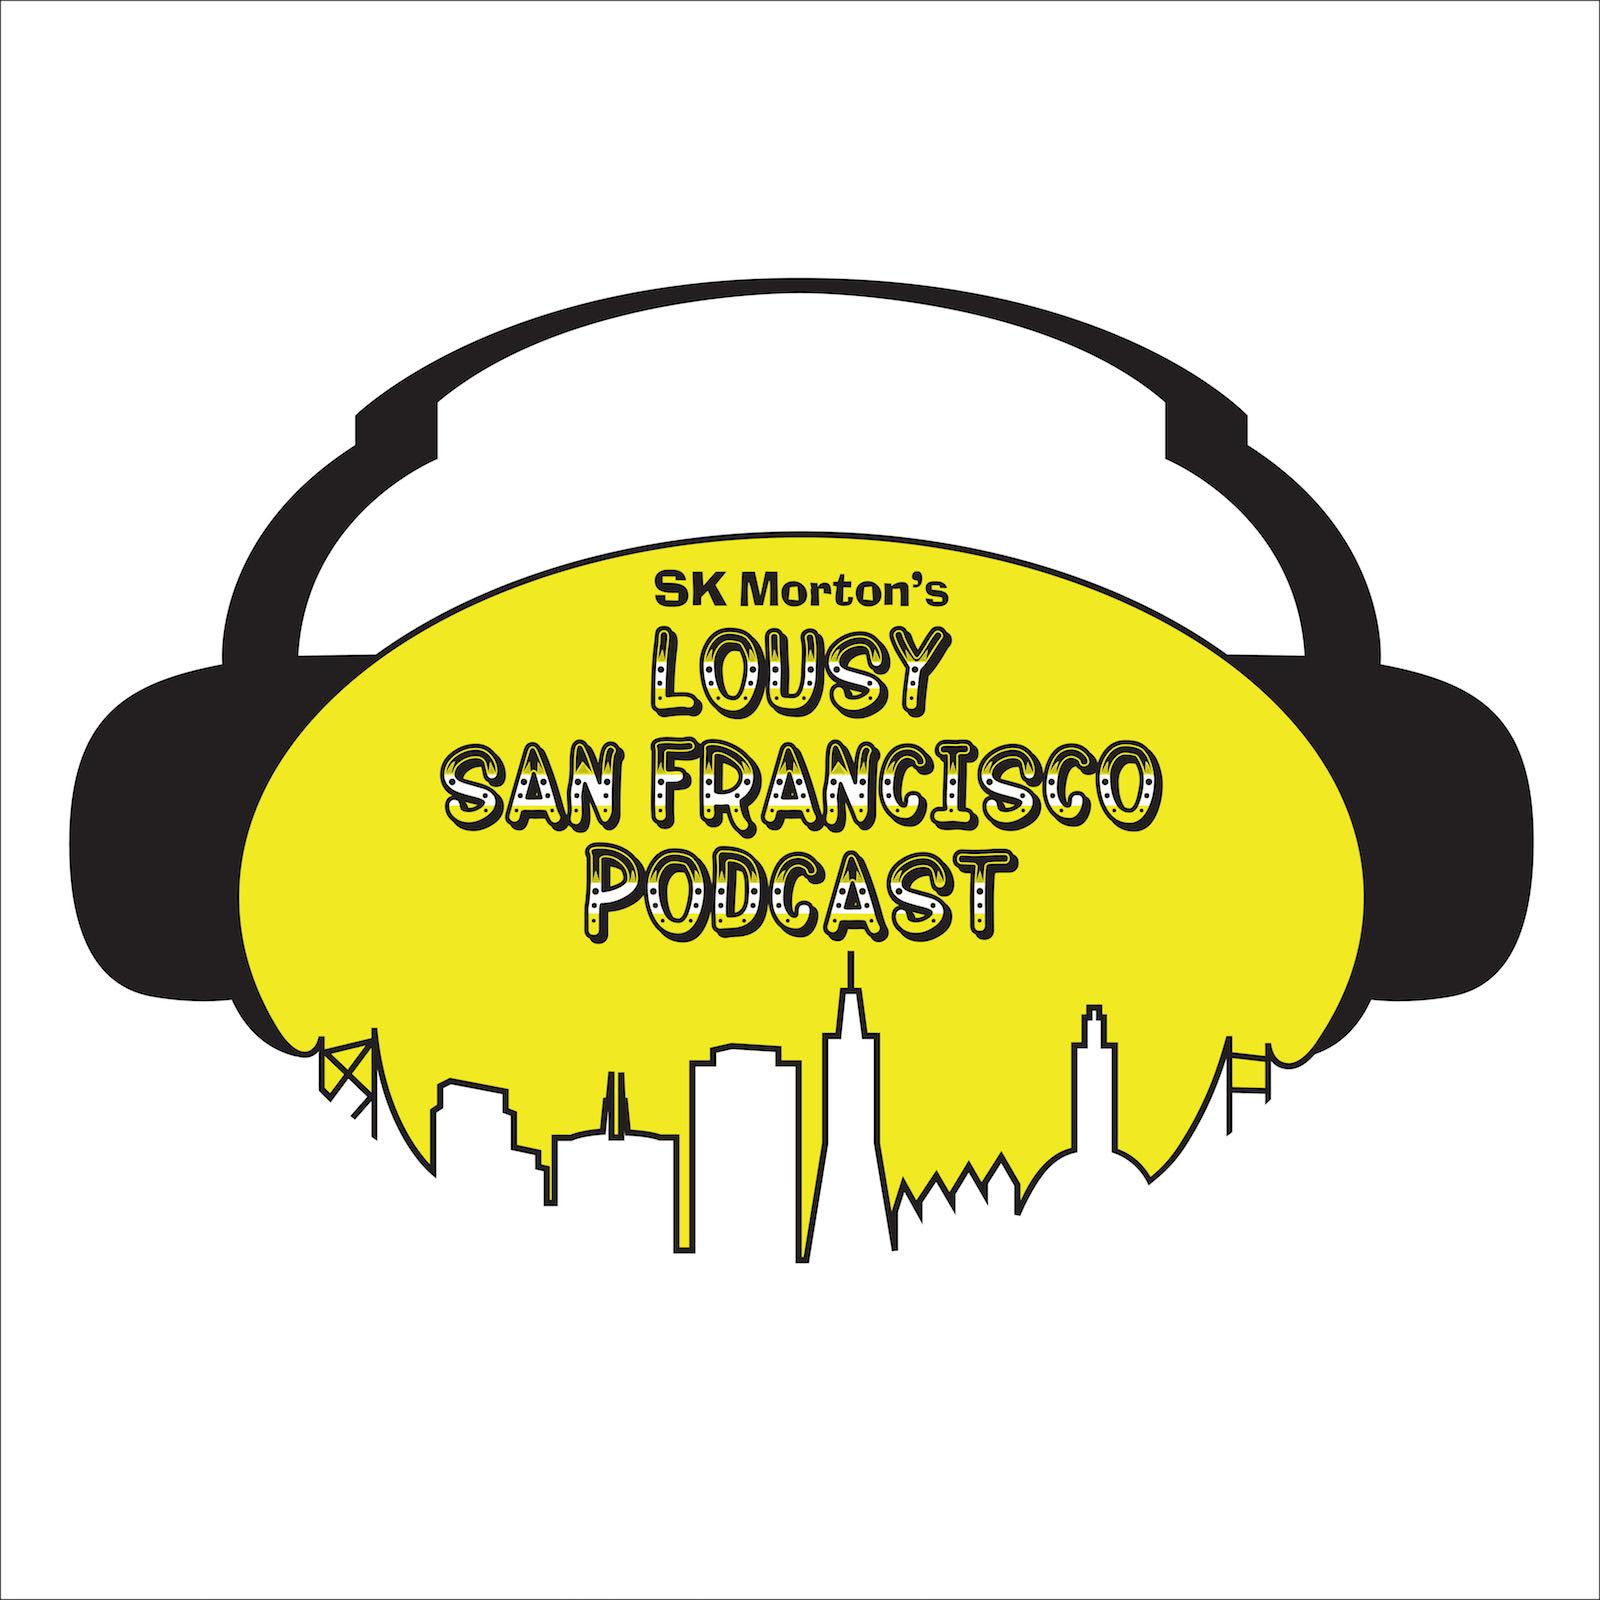 Logo-Podcast-1600x1600-vector.jpg